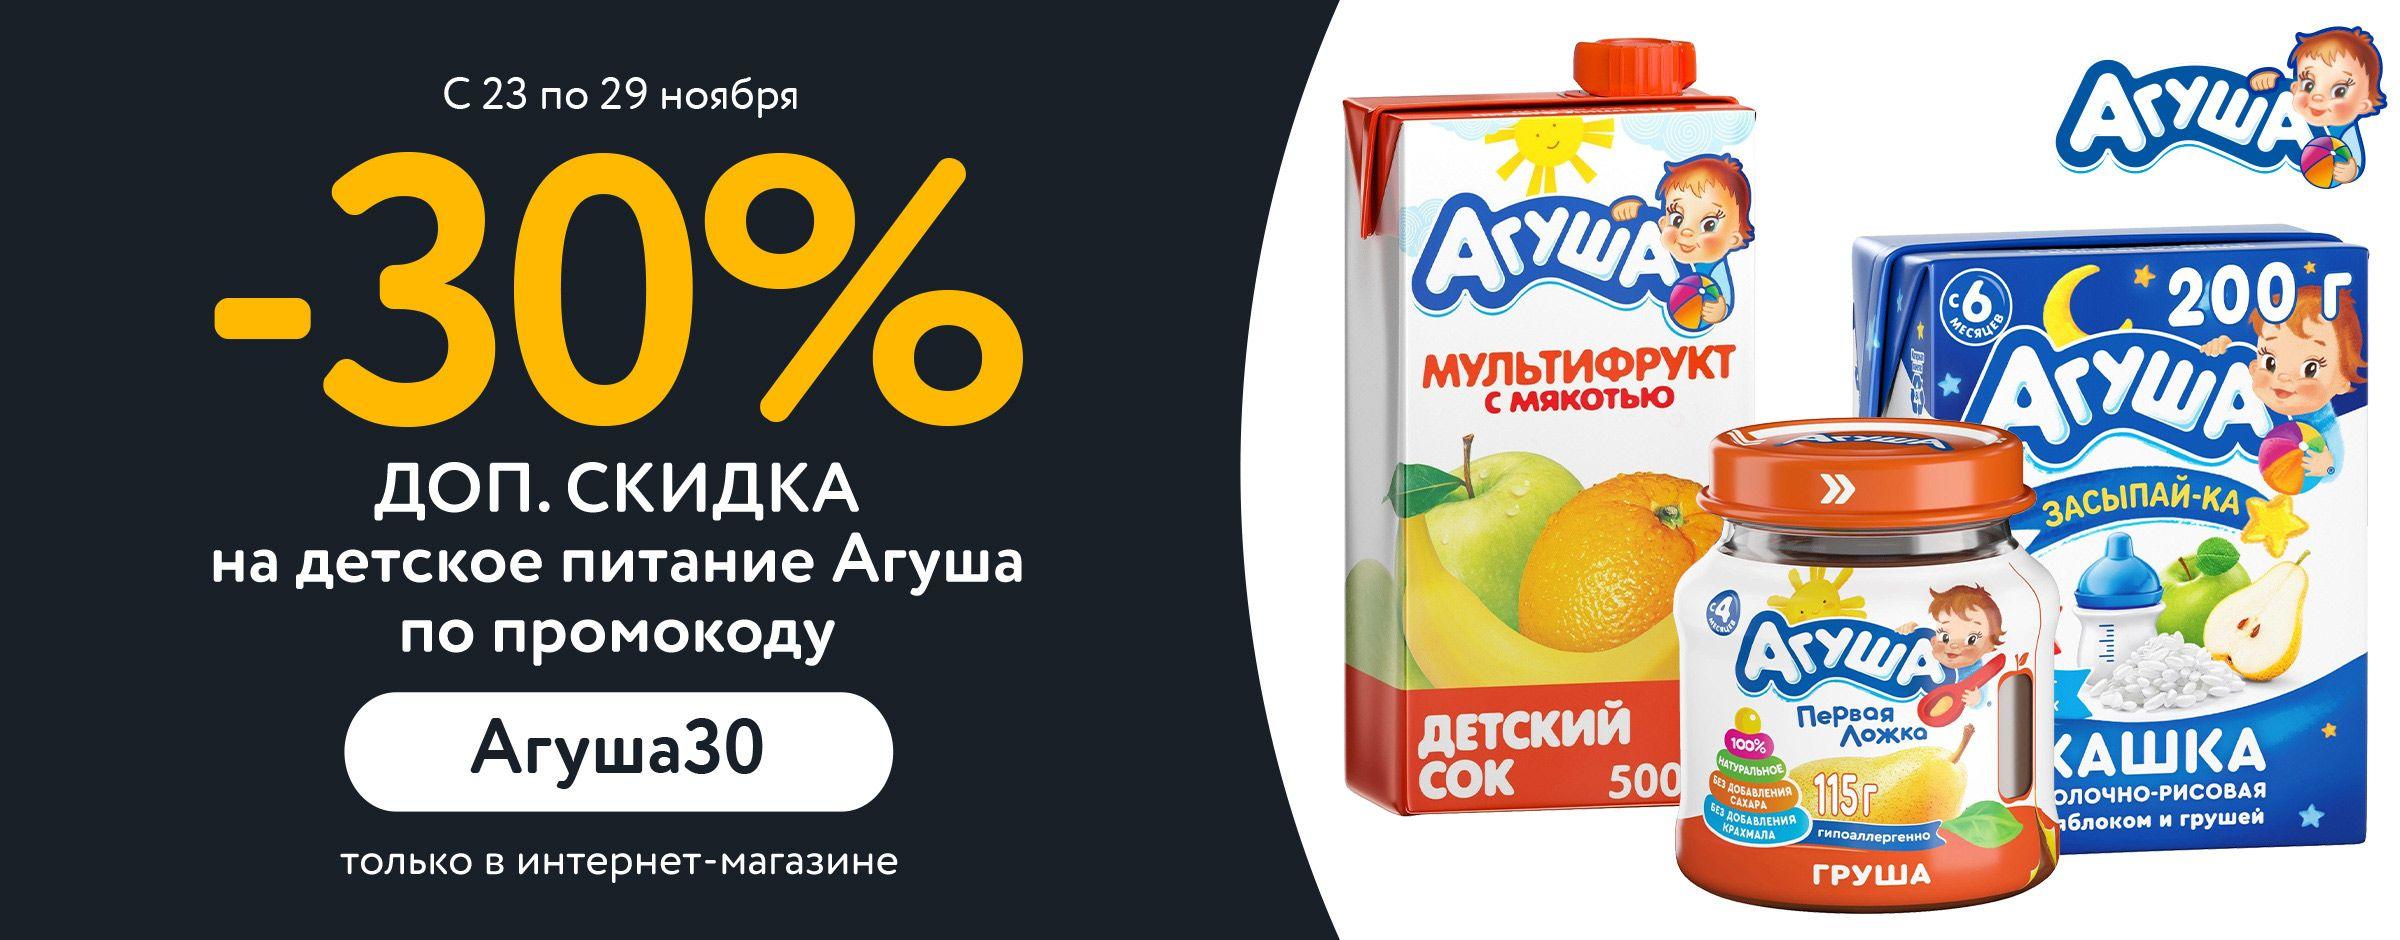 30% на питание Агуша по промокоду